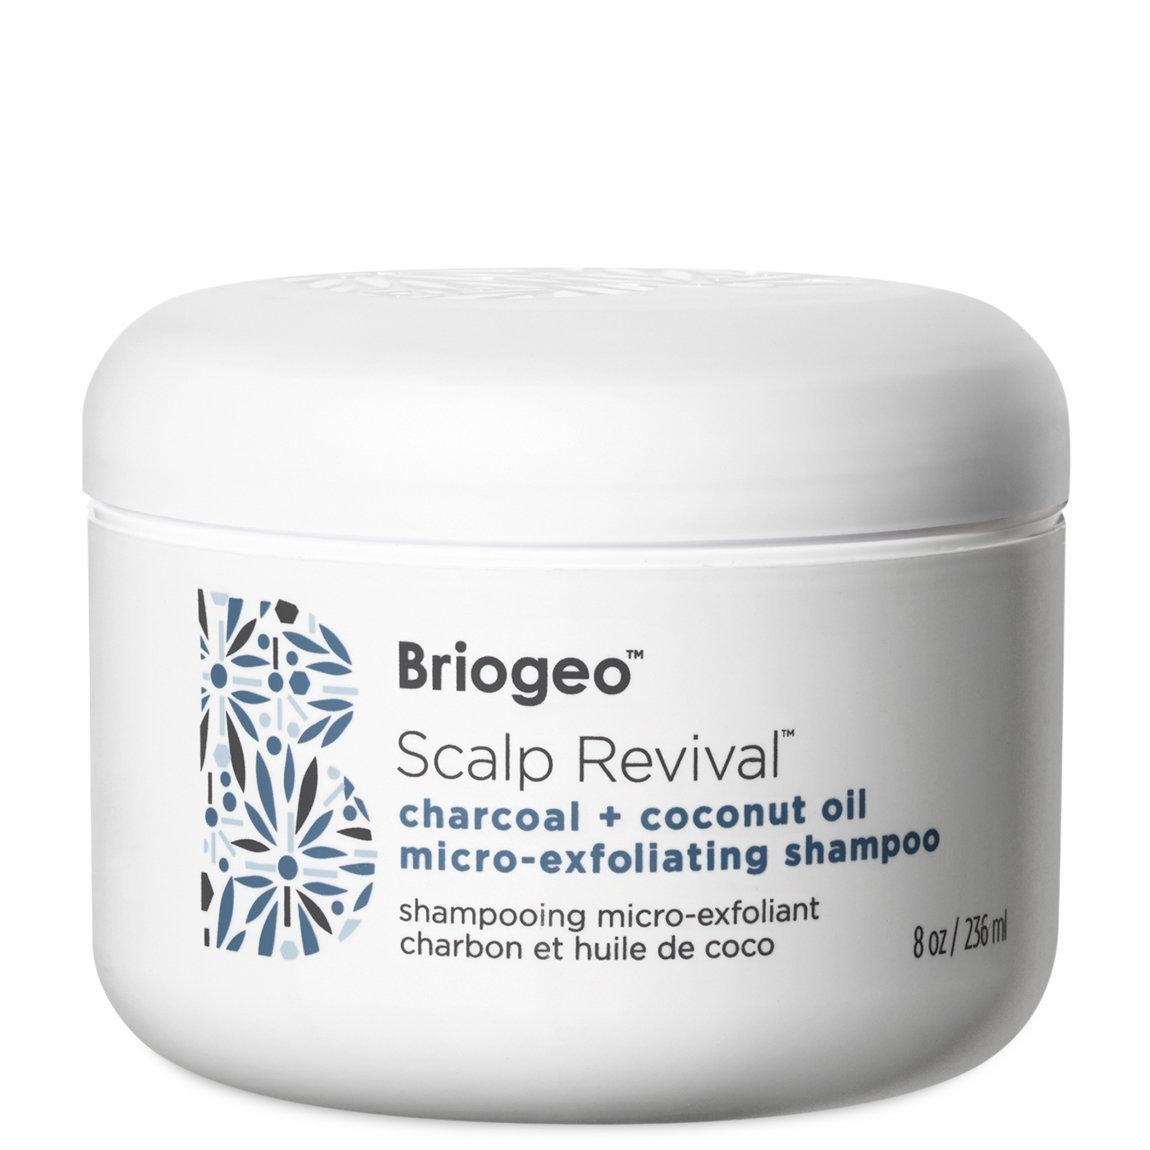 Briogeo Scalp Revival Charcoal + Coconut Oil Micro-Exfoliating Shampoo 8 oz product swatch.